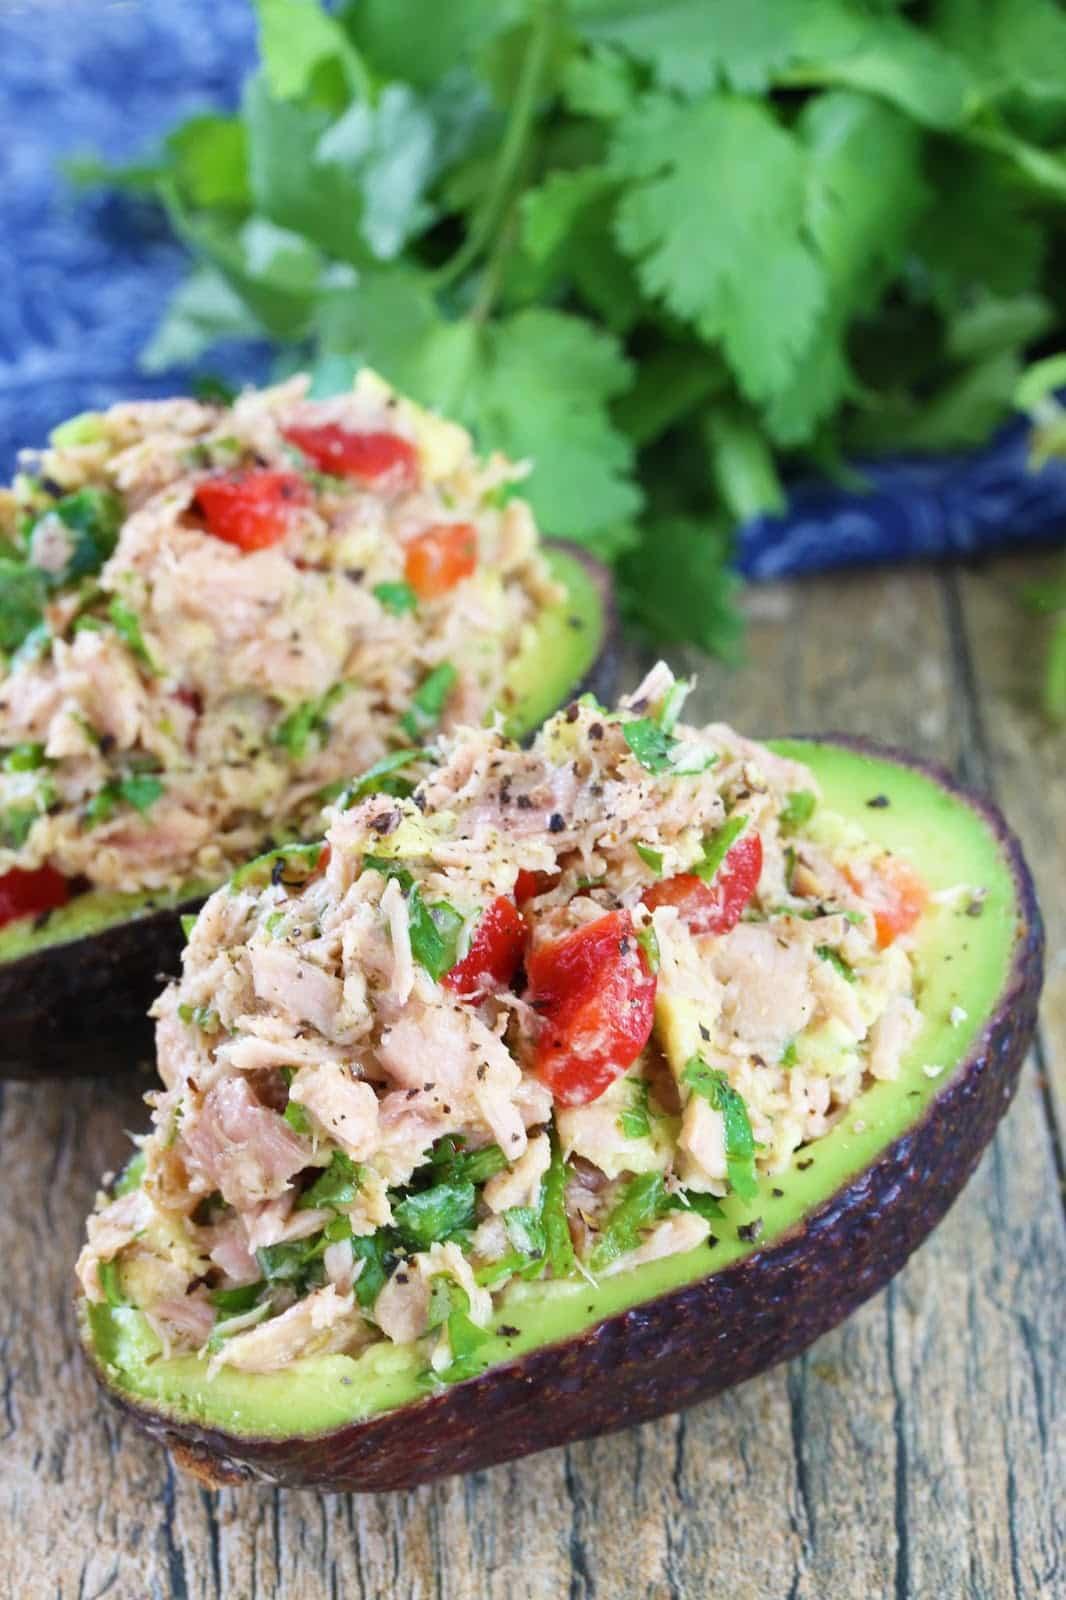 Easy Healthy Dinner Recipes  Healthy Thai Tuna Stuffed Avocado